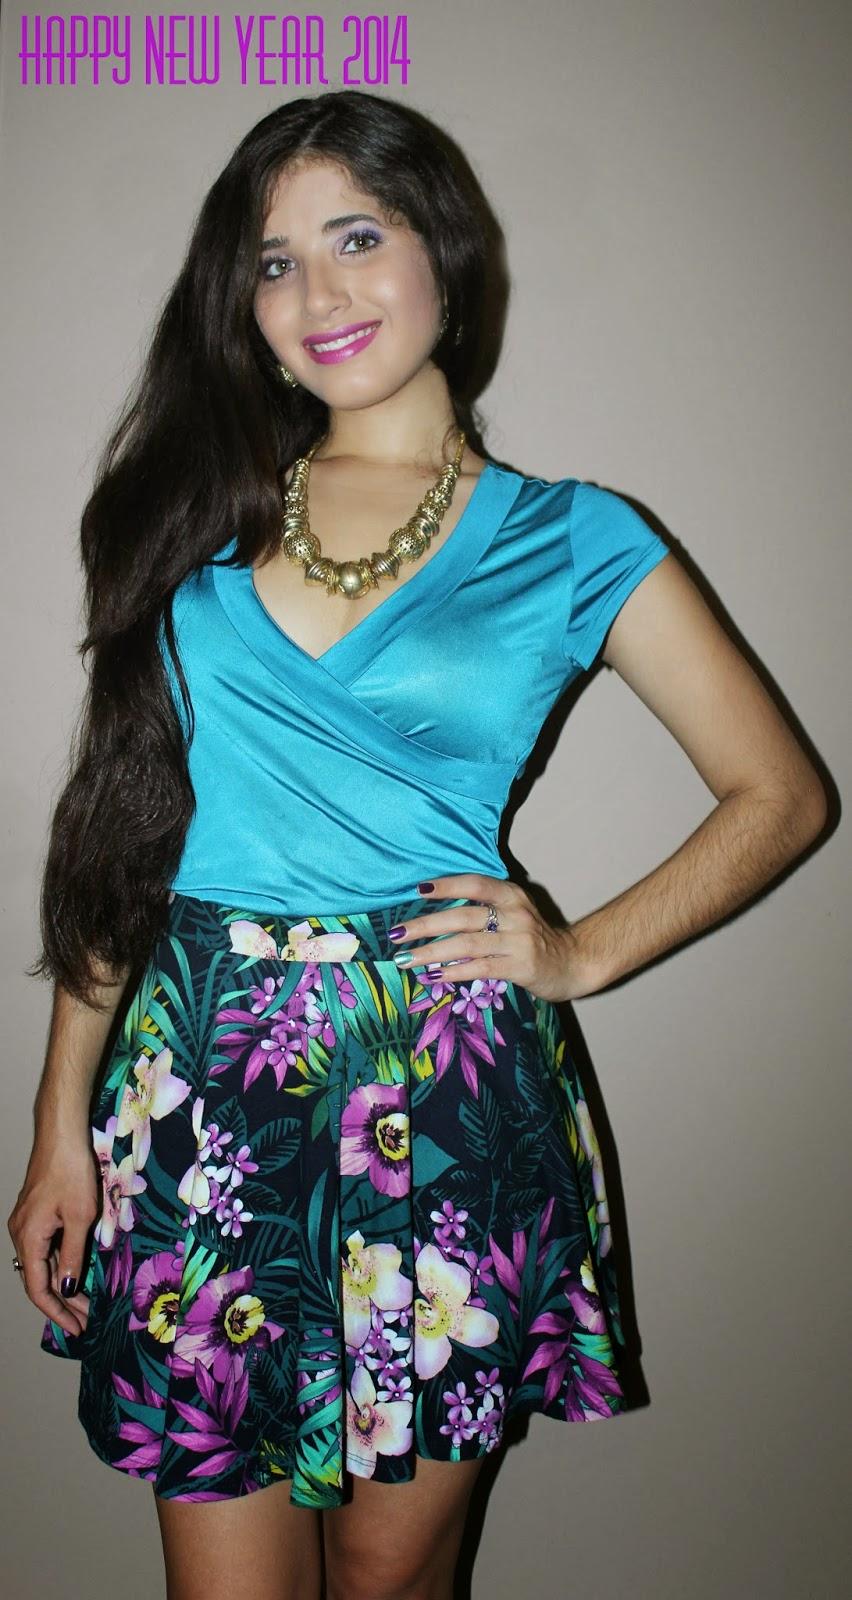 January 2014 - Unique fashion by Taryn